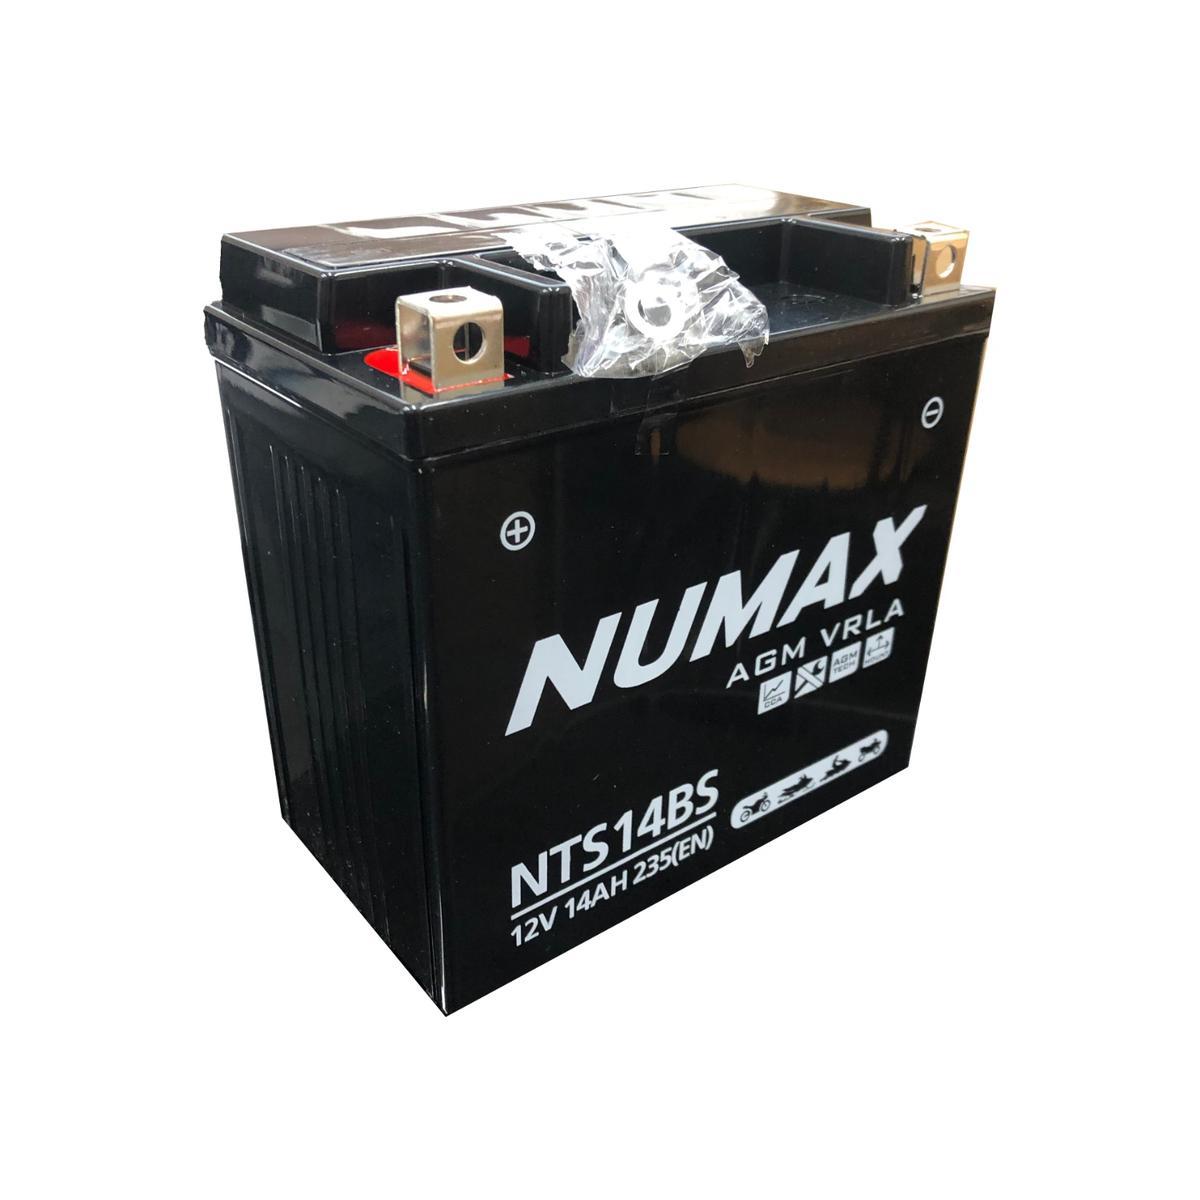 Numax NTS14BS 12v Motorbike Bike Battery HONDA 750cc XRV750 Africa Twin YTX14-4